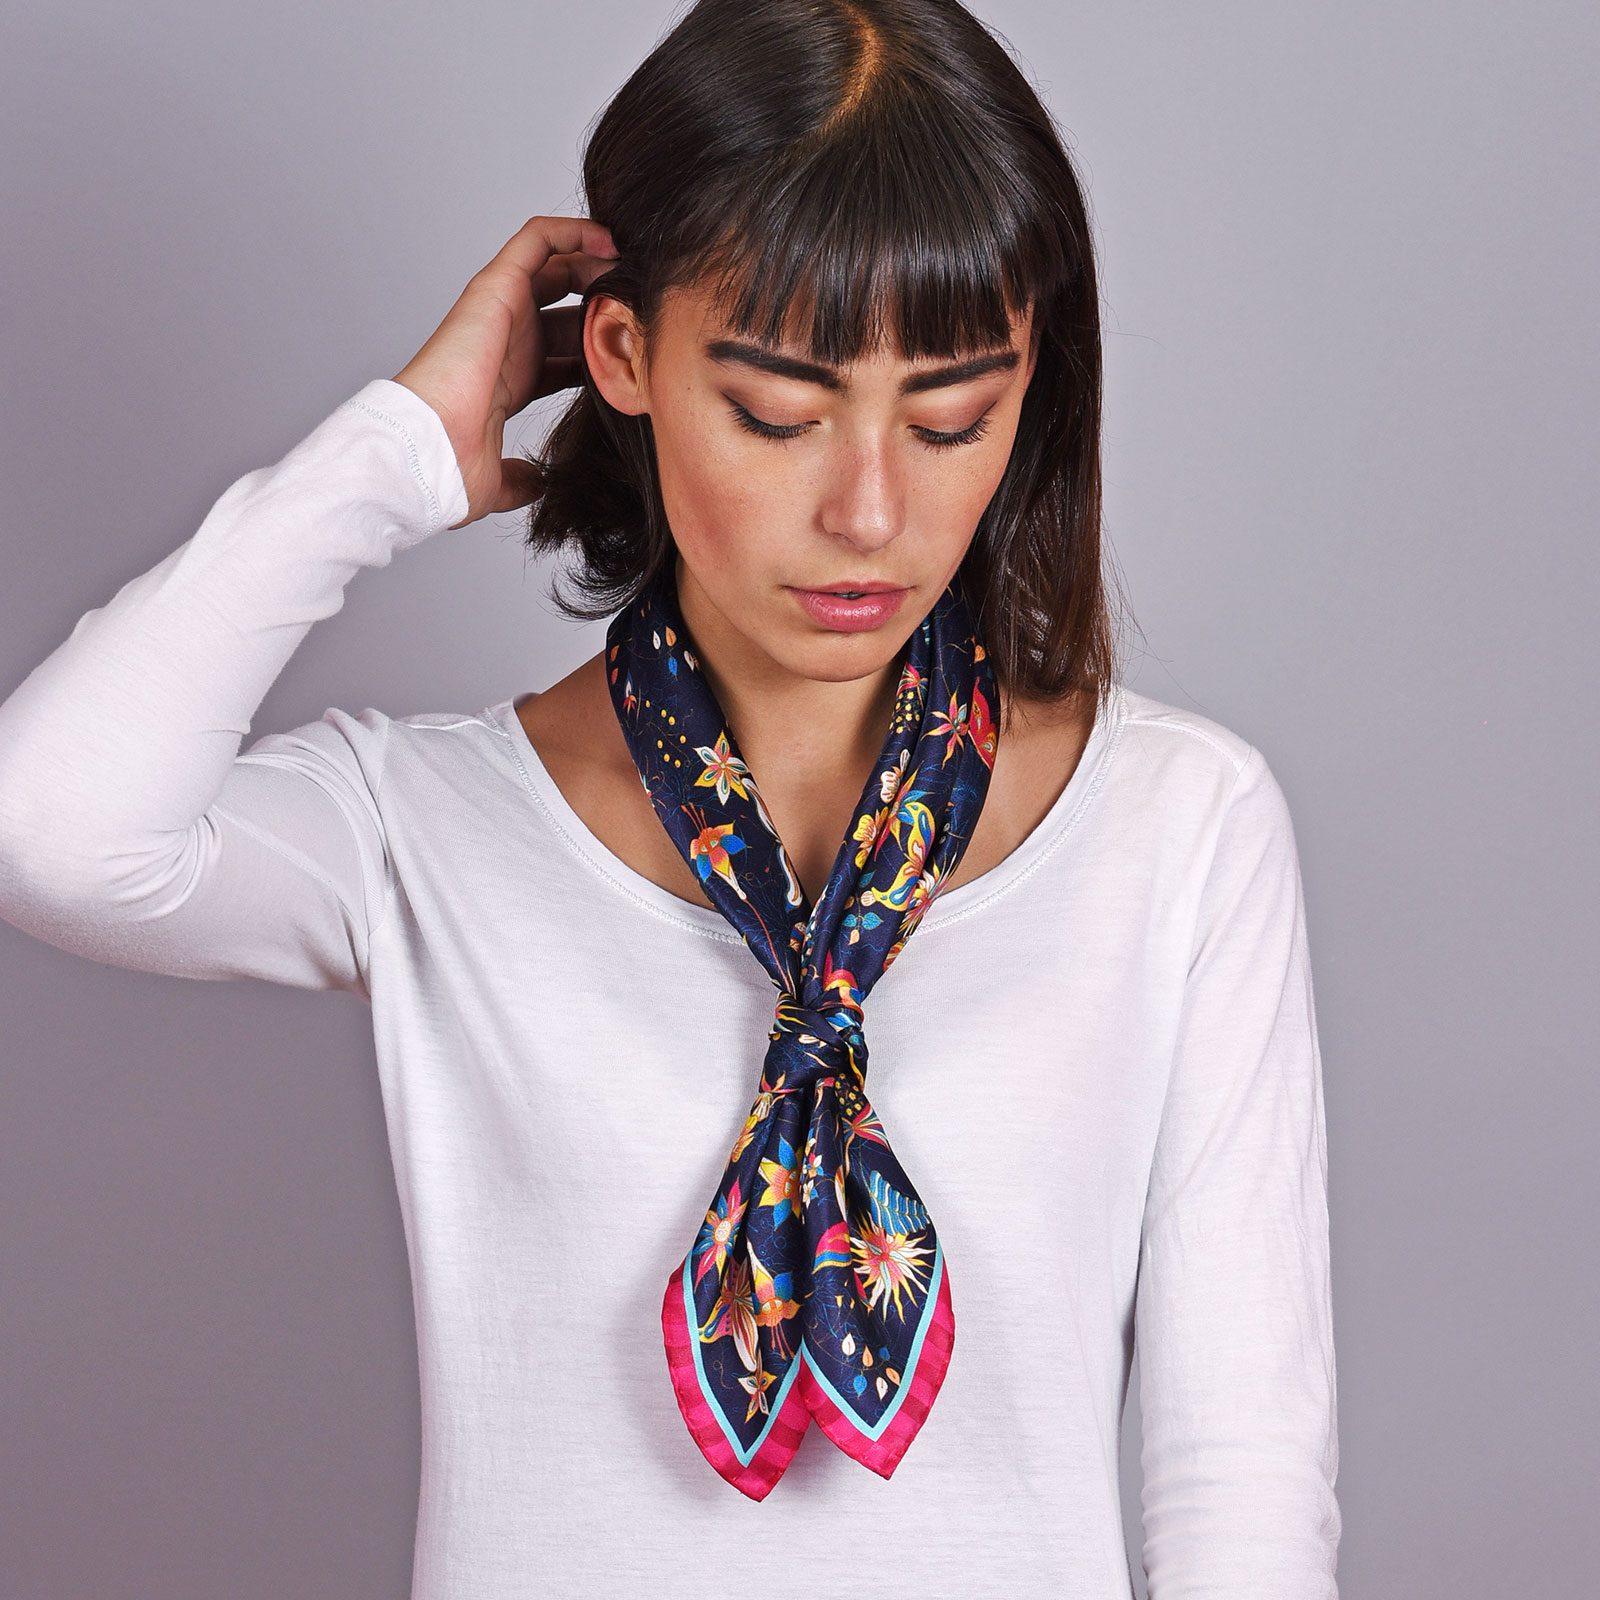 http://lookbook.allee-du-foulard.fr/wp-content/uploads/2018/12/AT-04602-VF16-2-carre-soie-femme-bleu-marine-made-in-italie-1600x1600.jpg